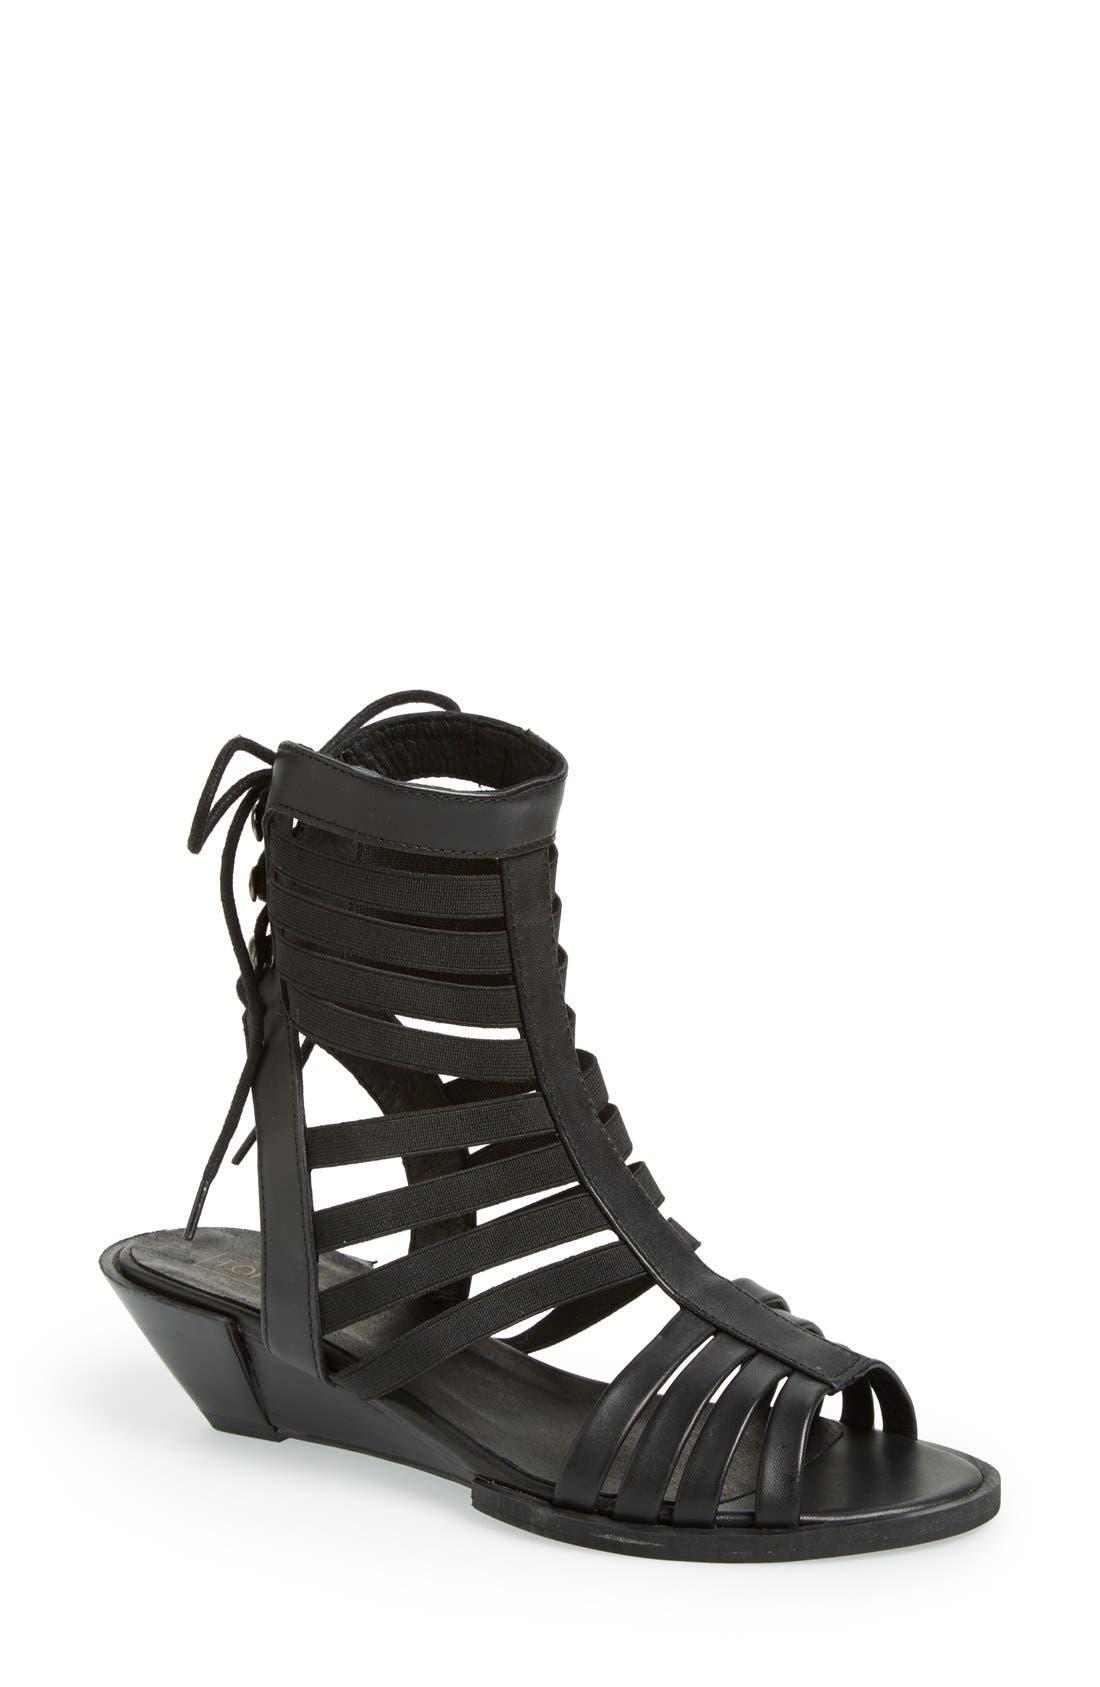 Main Image - Topshop 'Foil' Gladiator Sandal (Women)